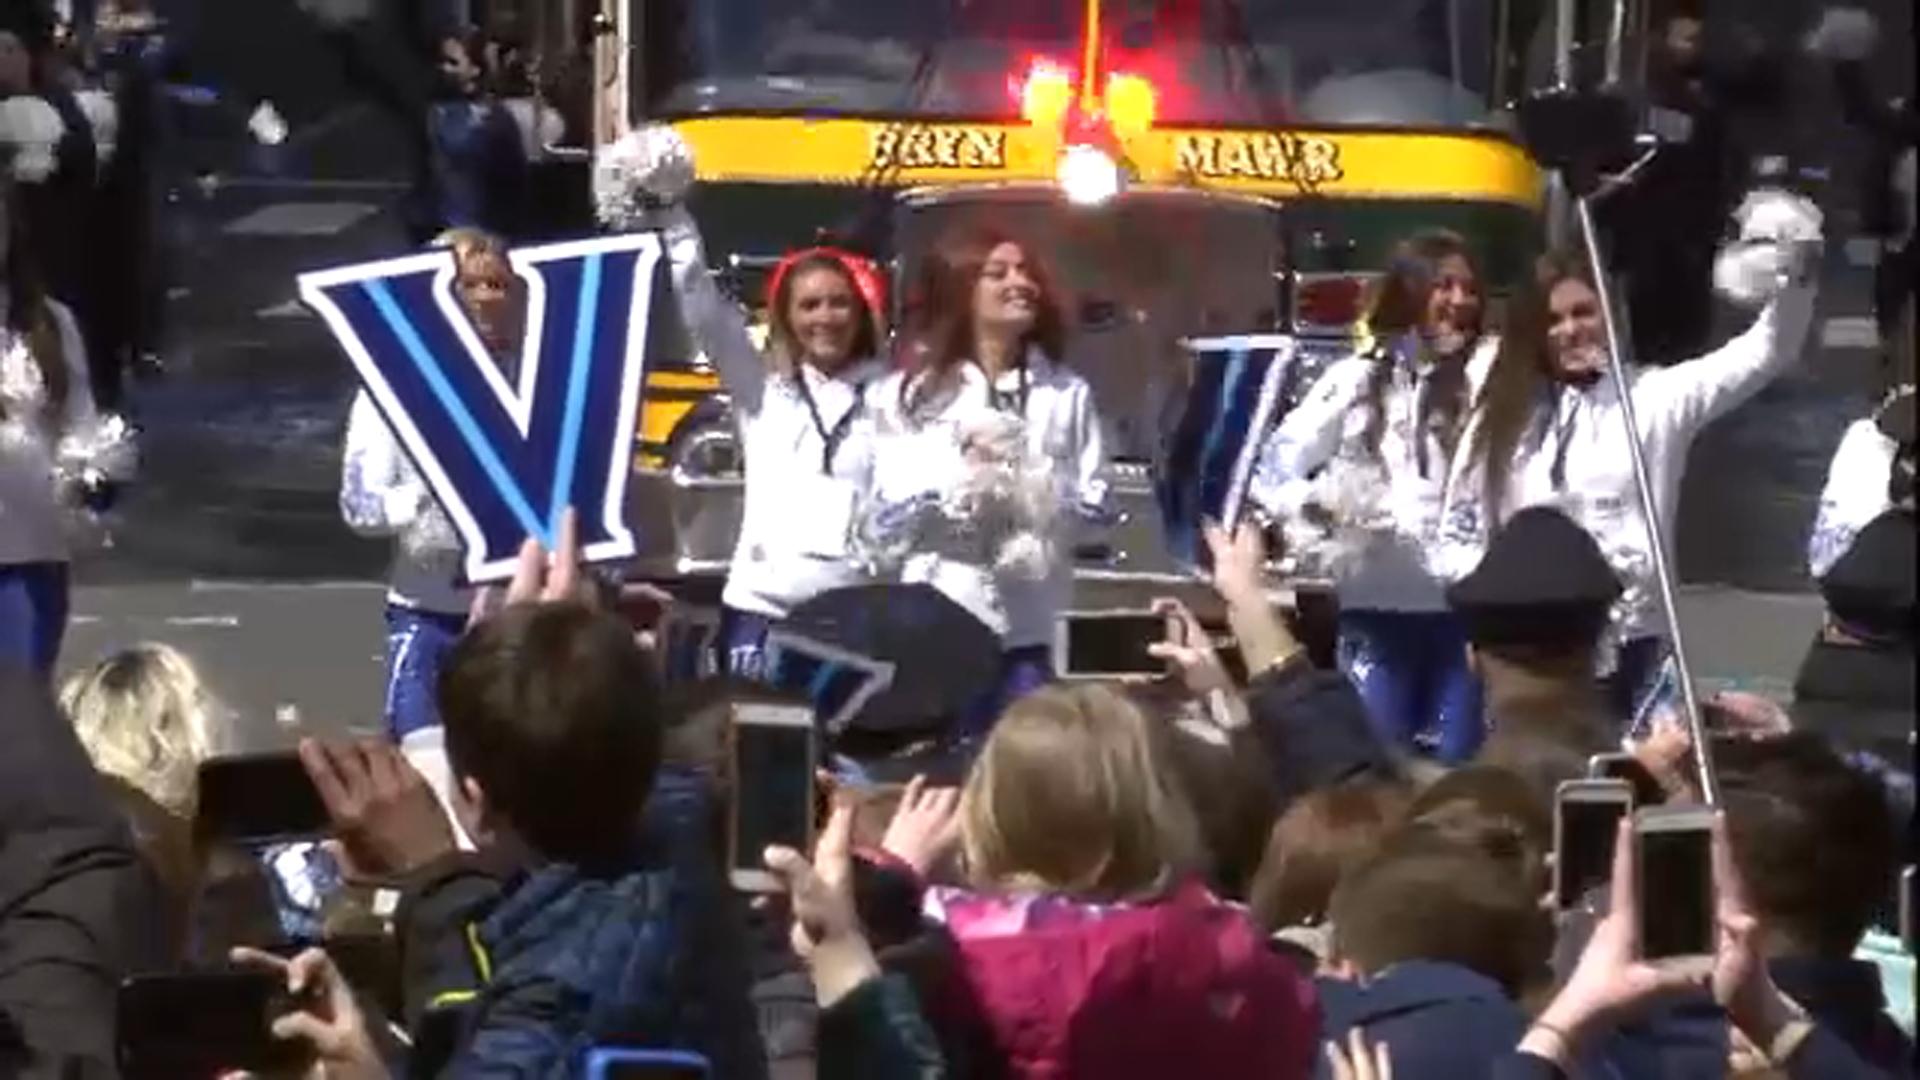 <div class='meta'><div class='origin-logo' data-origin='WPVI'></div><span class='caption-text' data-credit=''>Pictured: Villanova National Championship Parade in Center City Philadelphia on April 5, 2018.</span></div>